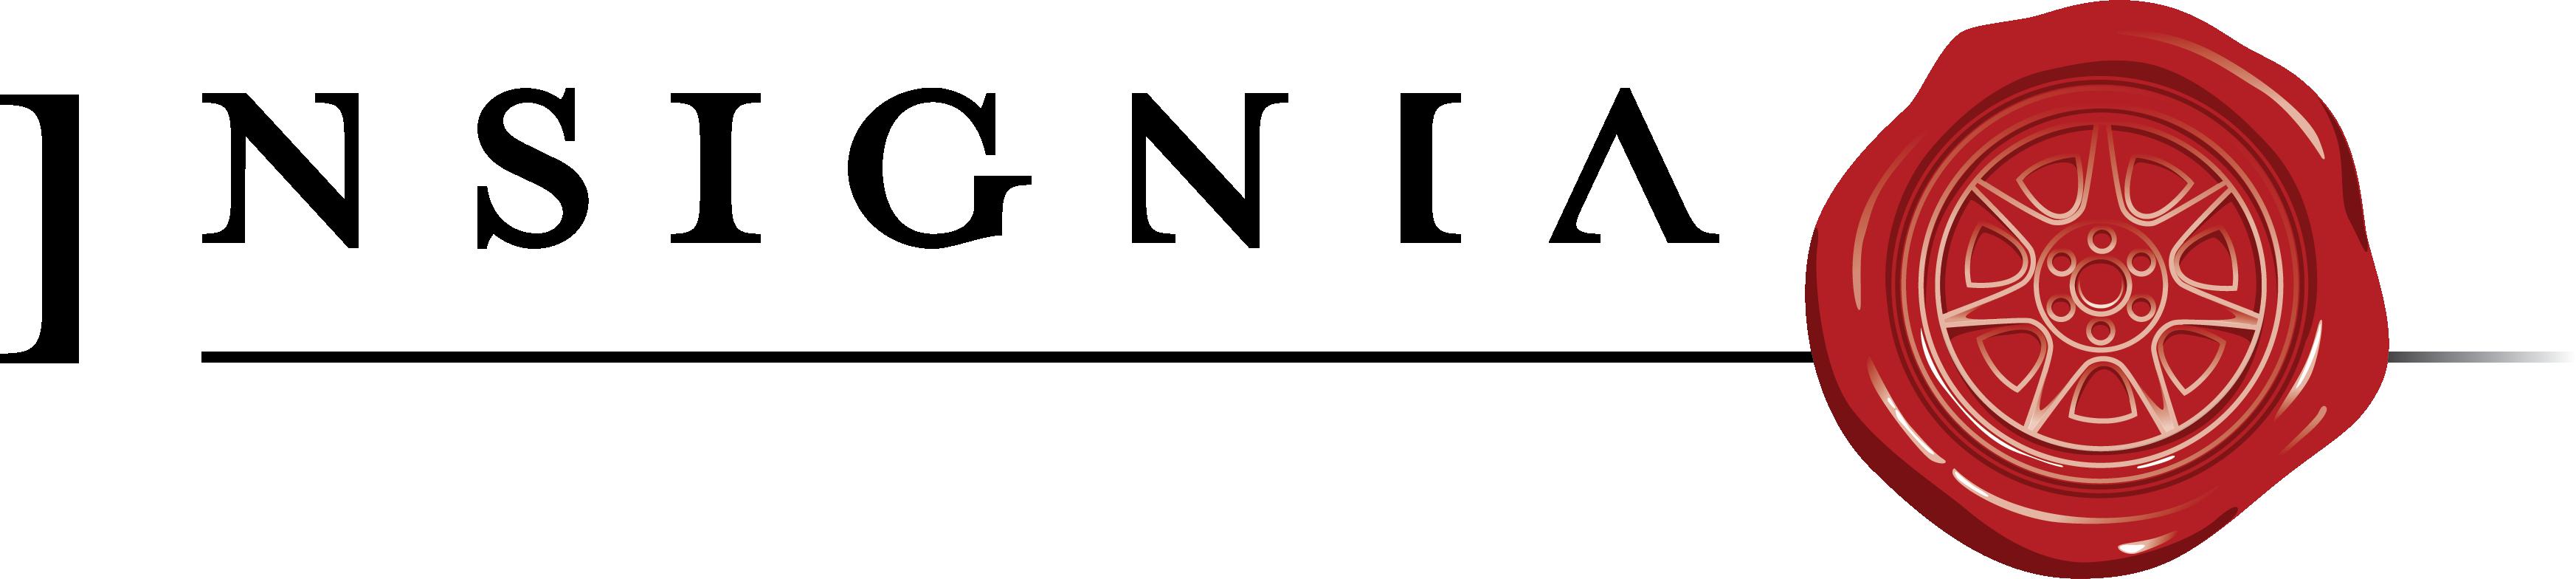 Insignia Group logo